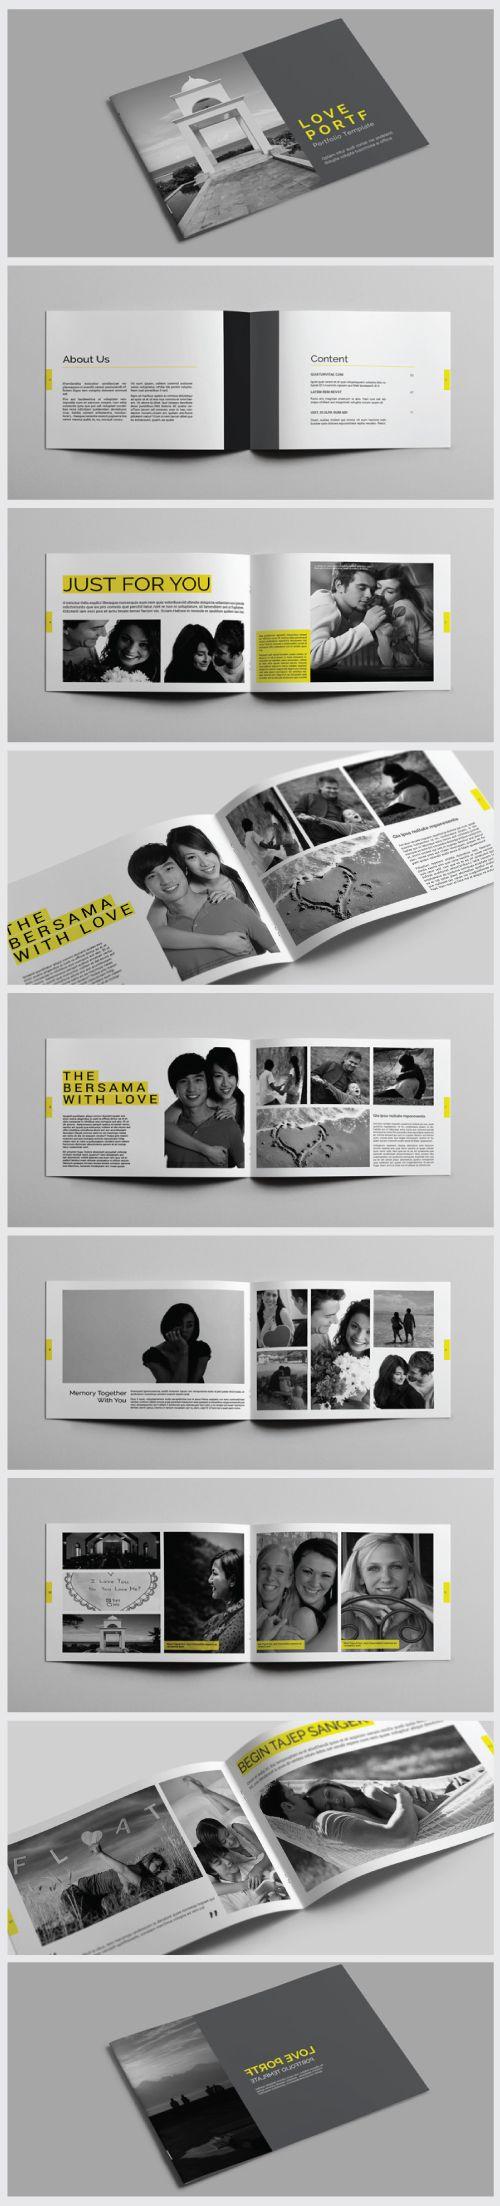 A4 / A5 Portfolio / Brochure Template #booklet #brochuredesign #brochuretemplates #catalogdesign